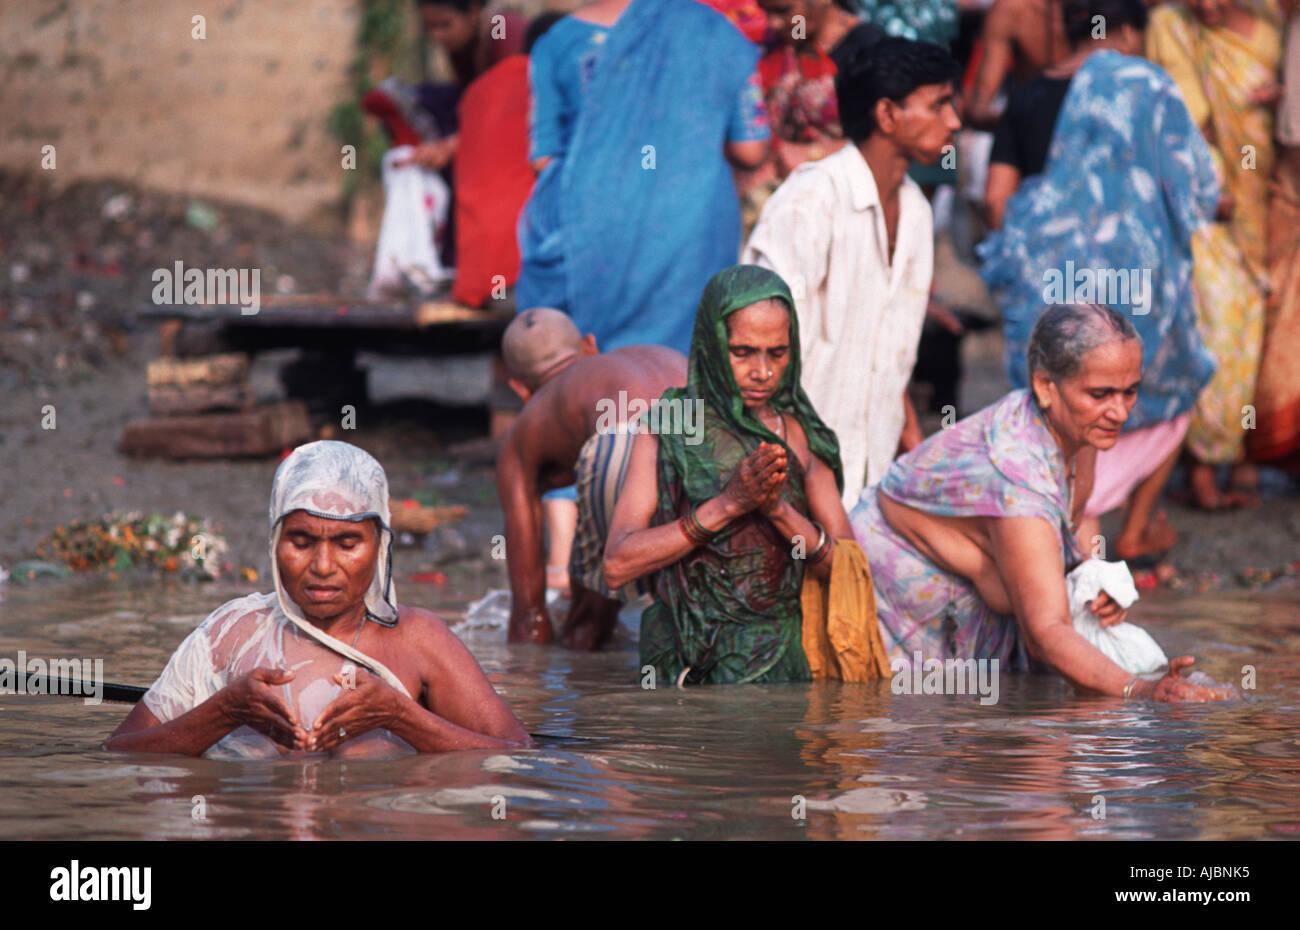 Indian women undertaking ritual bathing in the Ganges at Varanasi India - Stock Image